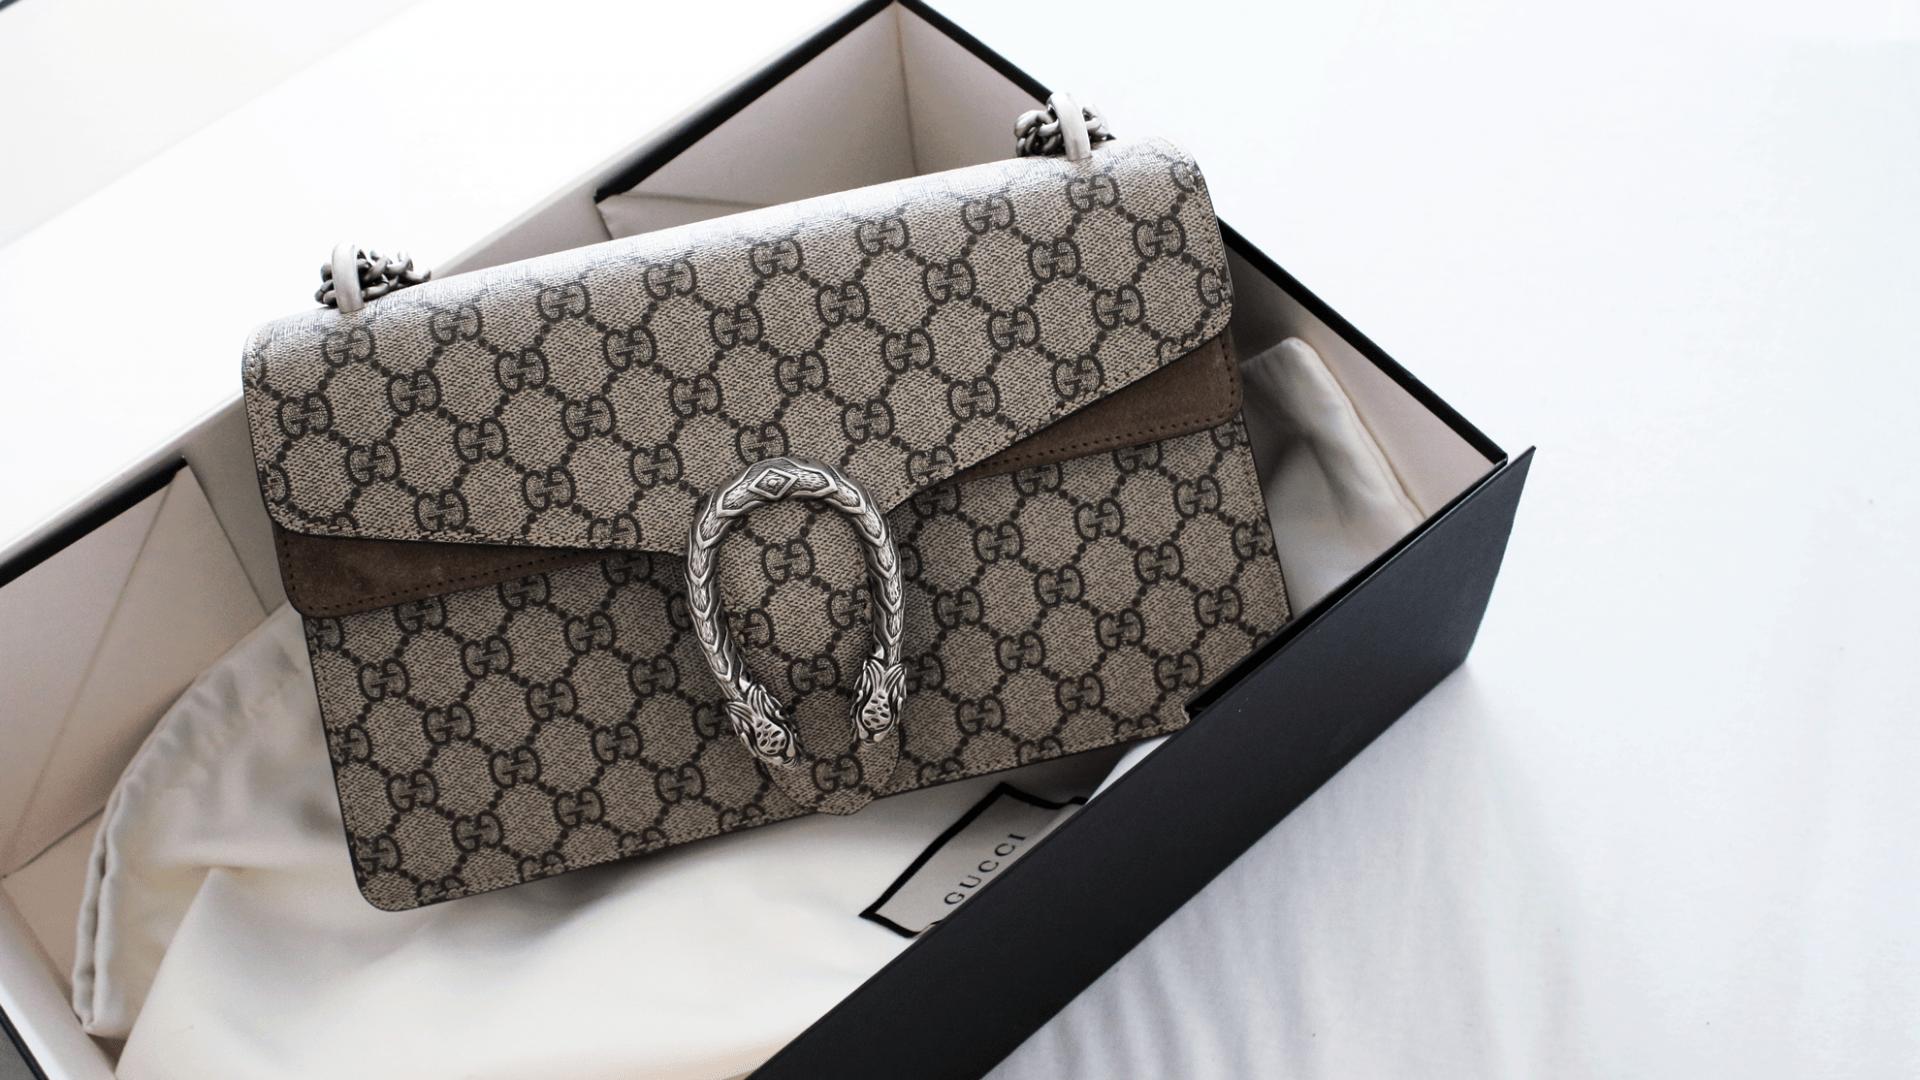 Buy The Exact Designer Bag For A Lesser Price With Replica Designer Handbags